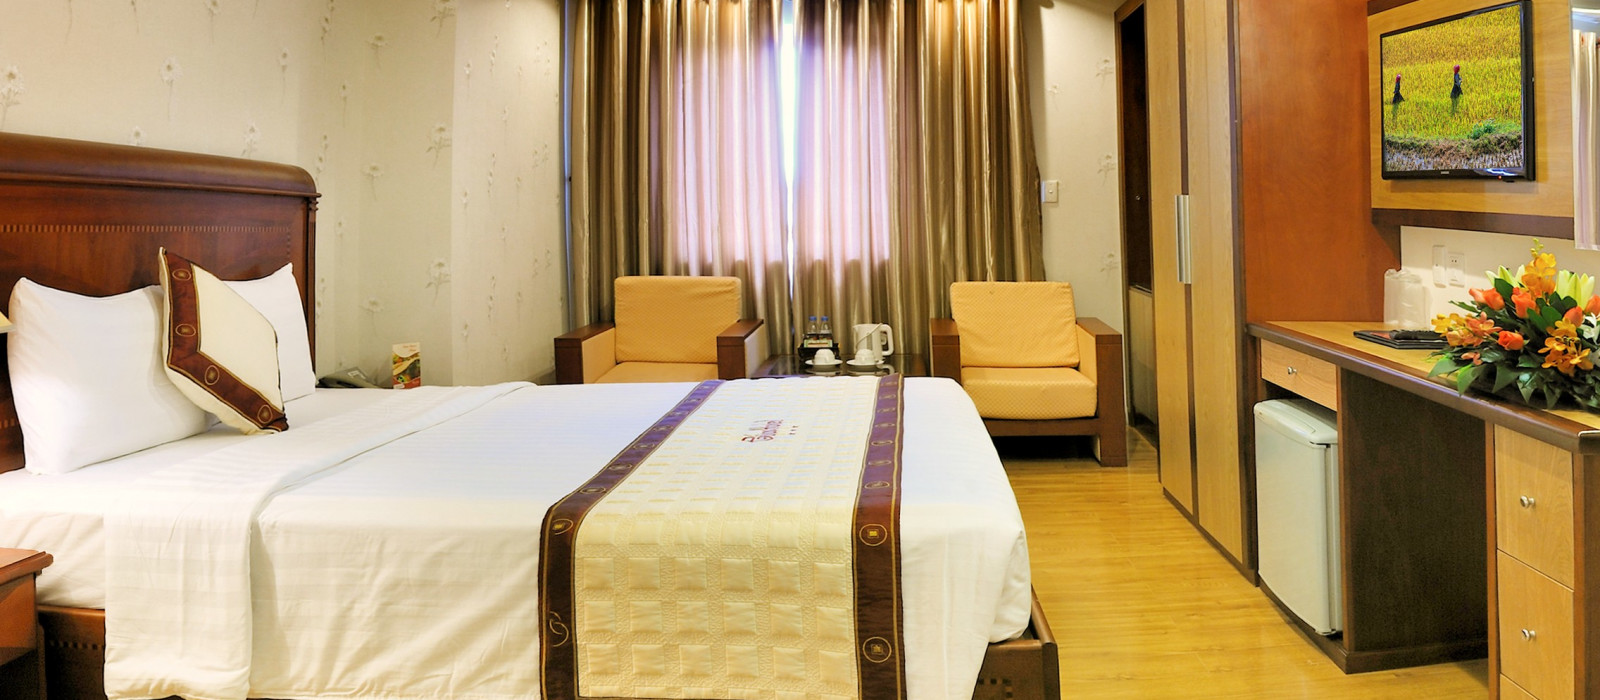 Hotel Elios  Saigon Vietnam